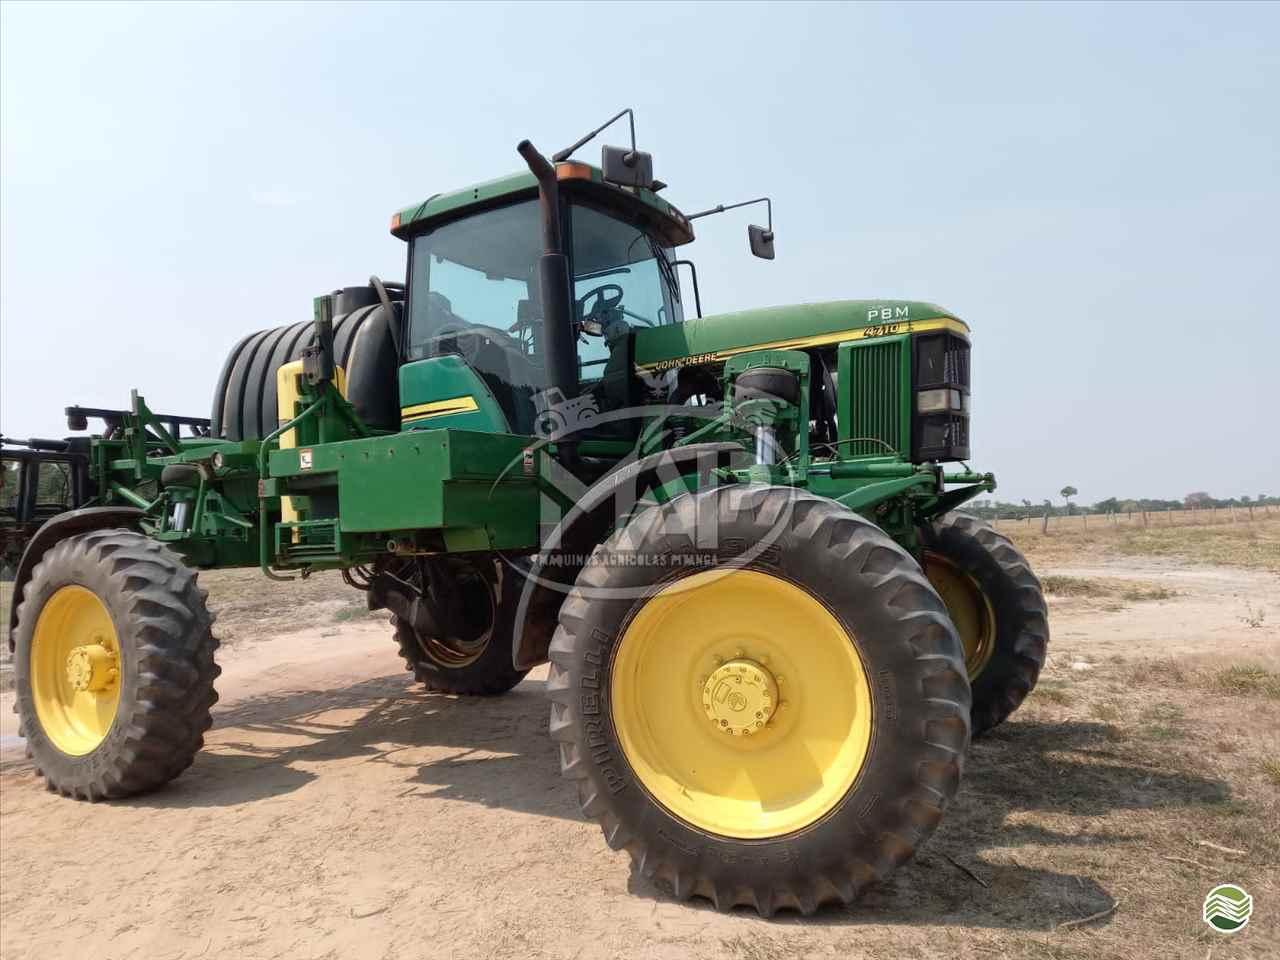 PULVERIZADOR JOHN DEERE JOHN DEERE 4710 Tração 4x4 Máquinas Agrícolas Pitanga PITANGA PARANÁ PR